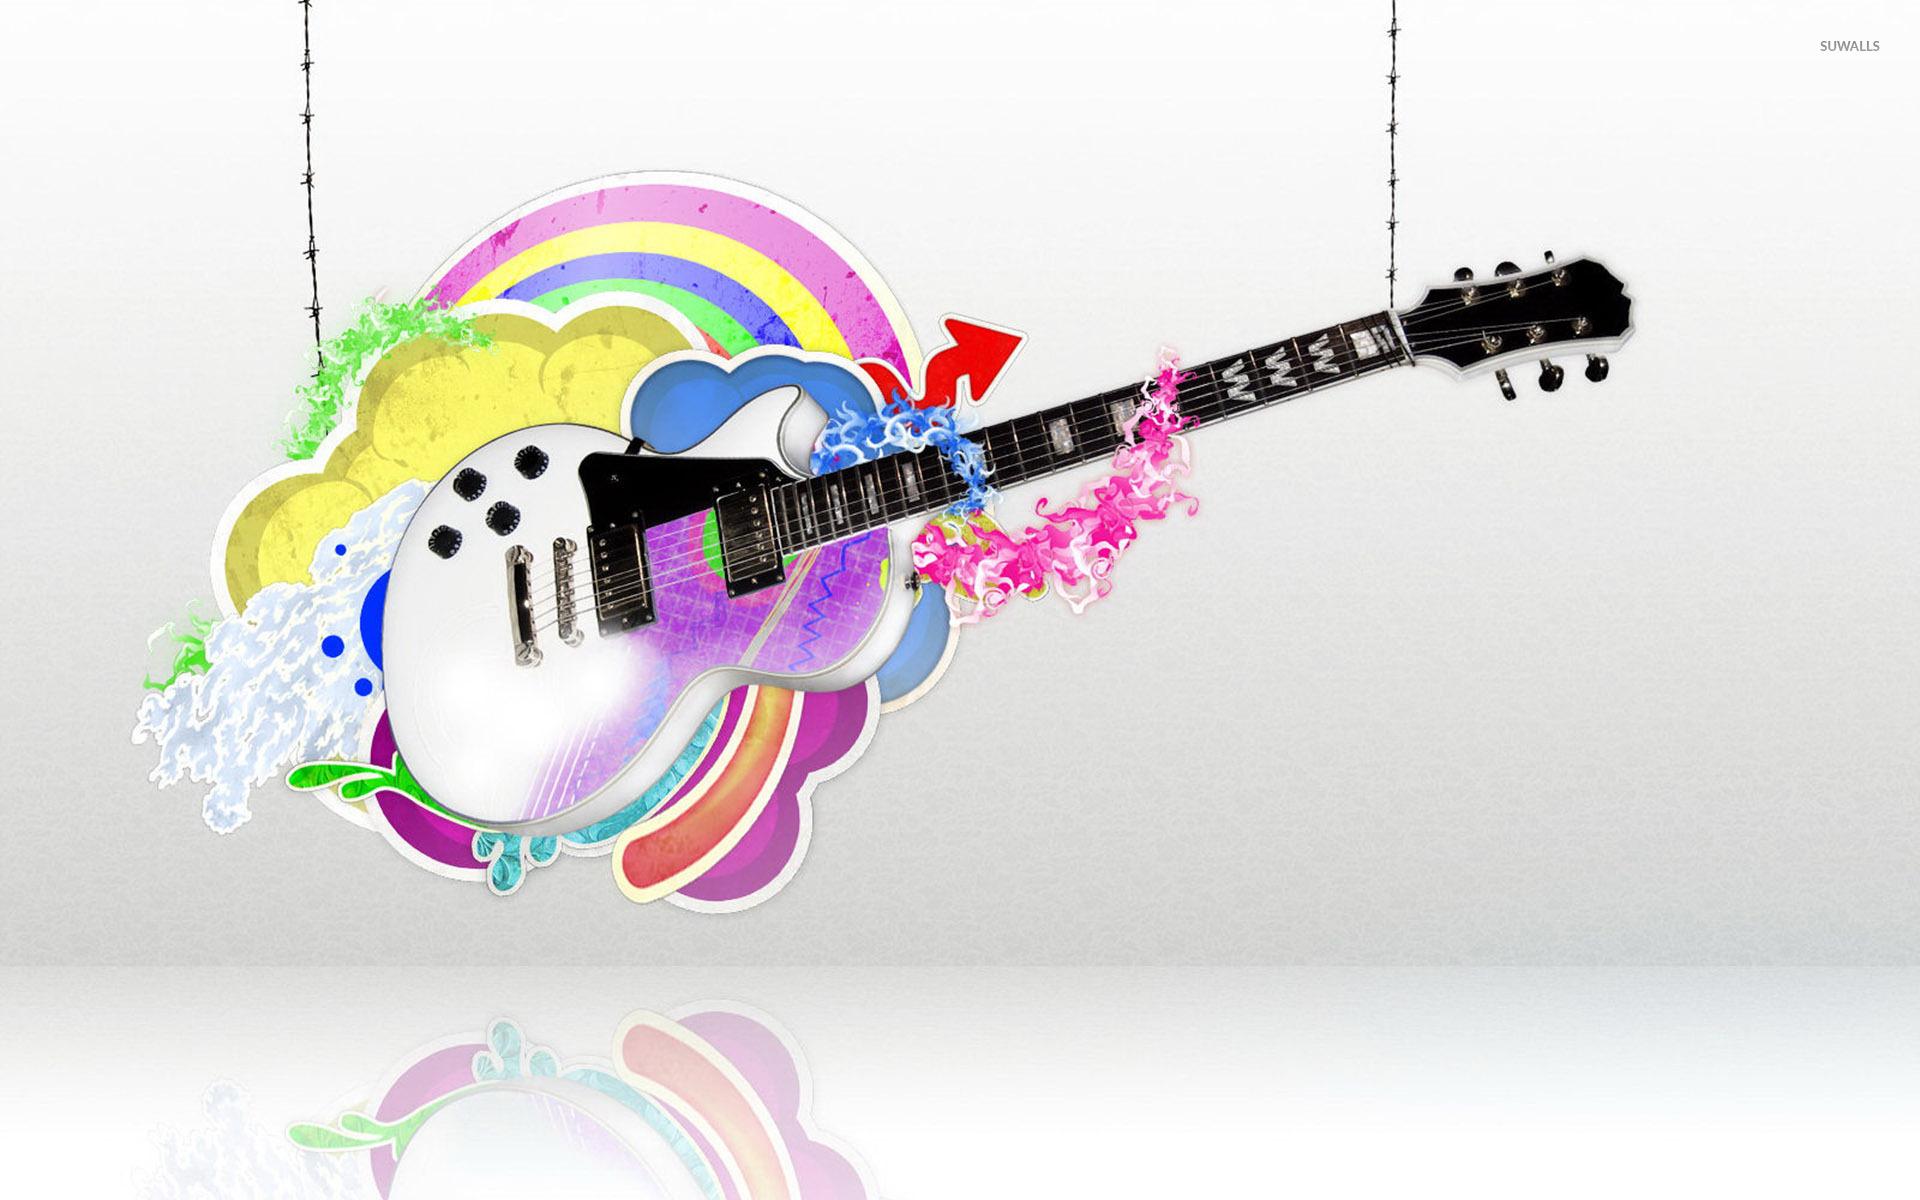 Strings Quotes Wallpaper Guitar Held By Strings Wallpaper Digital Art Wallpapers